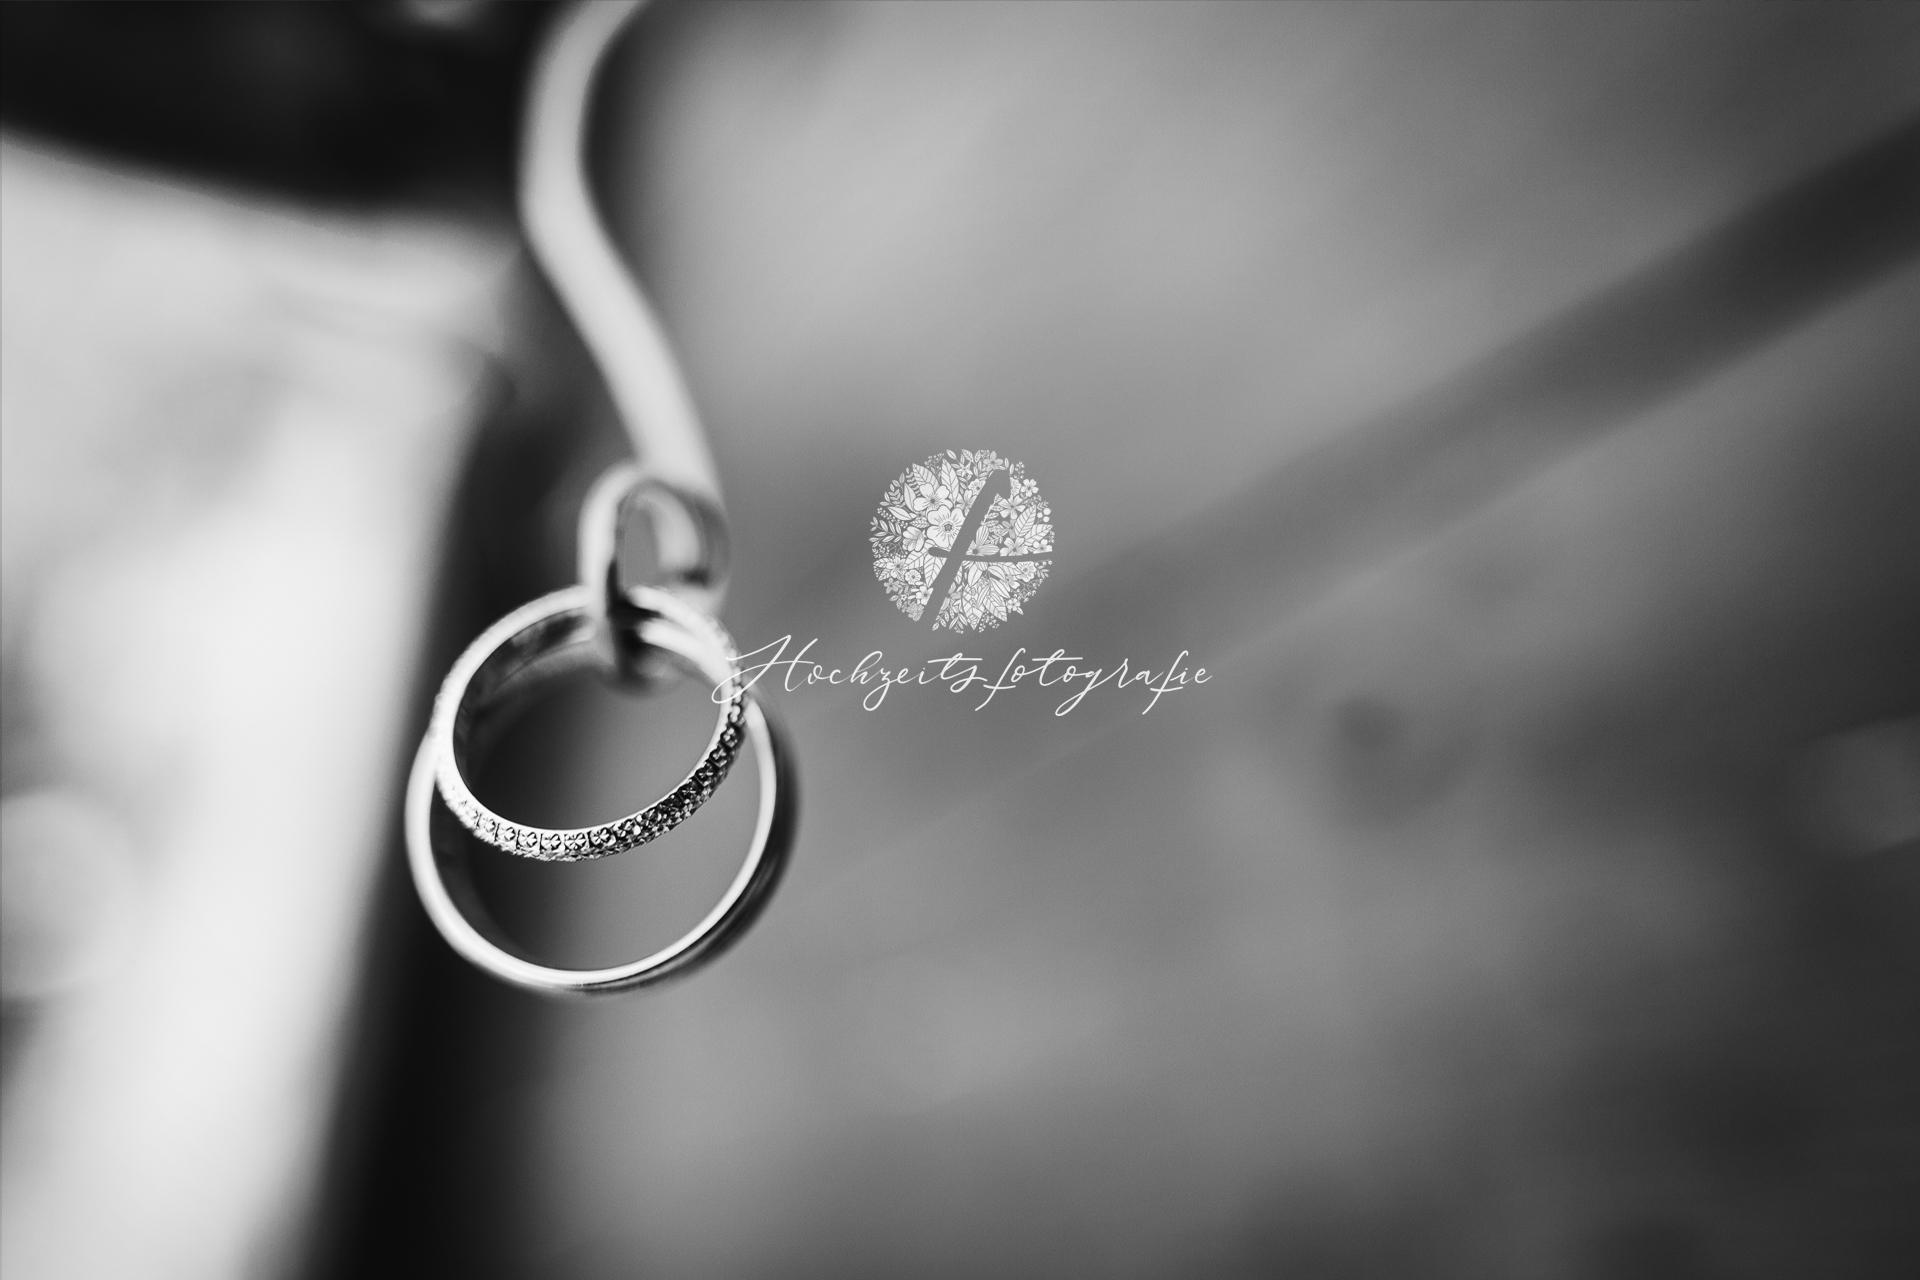 fotonen_Hochzeitsfotograf_leipzig-ringe